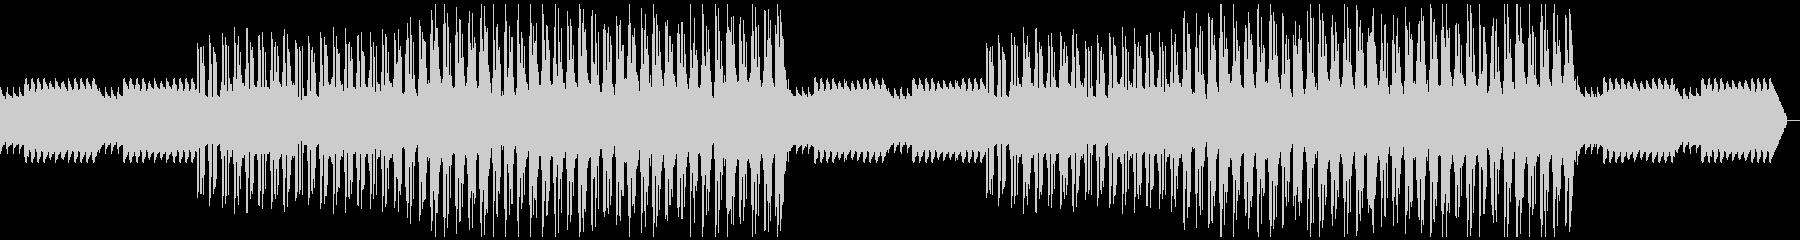 Lo-FI Hiphop 2の未再生の波形